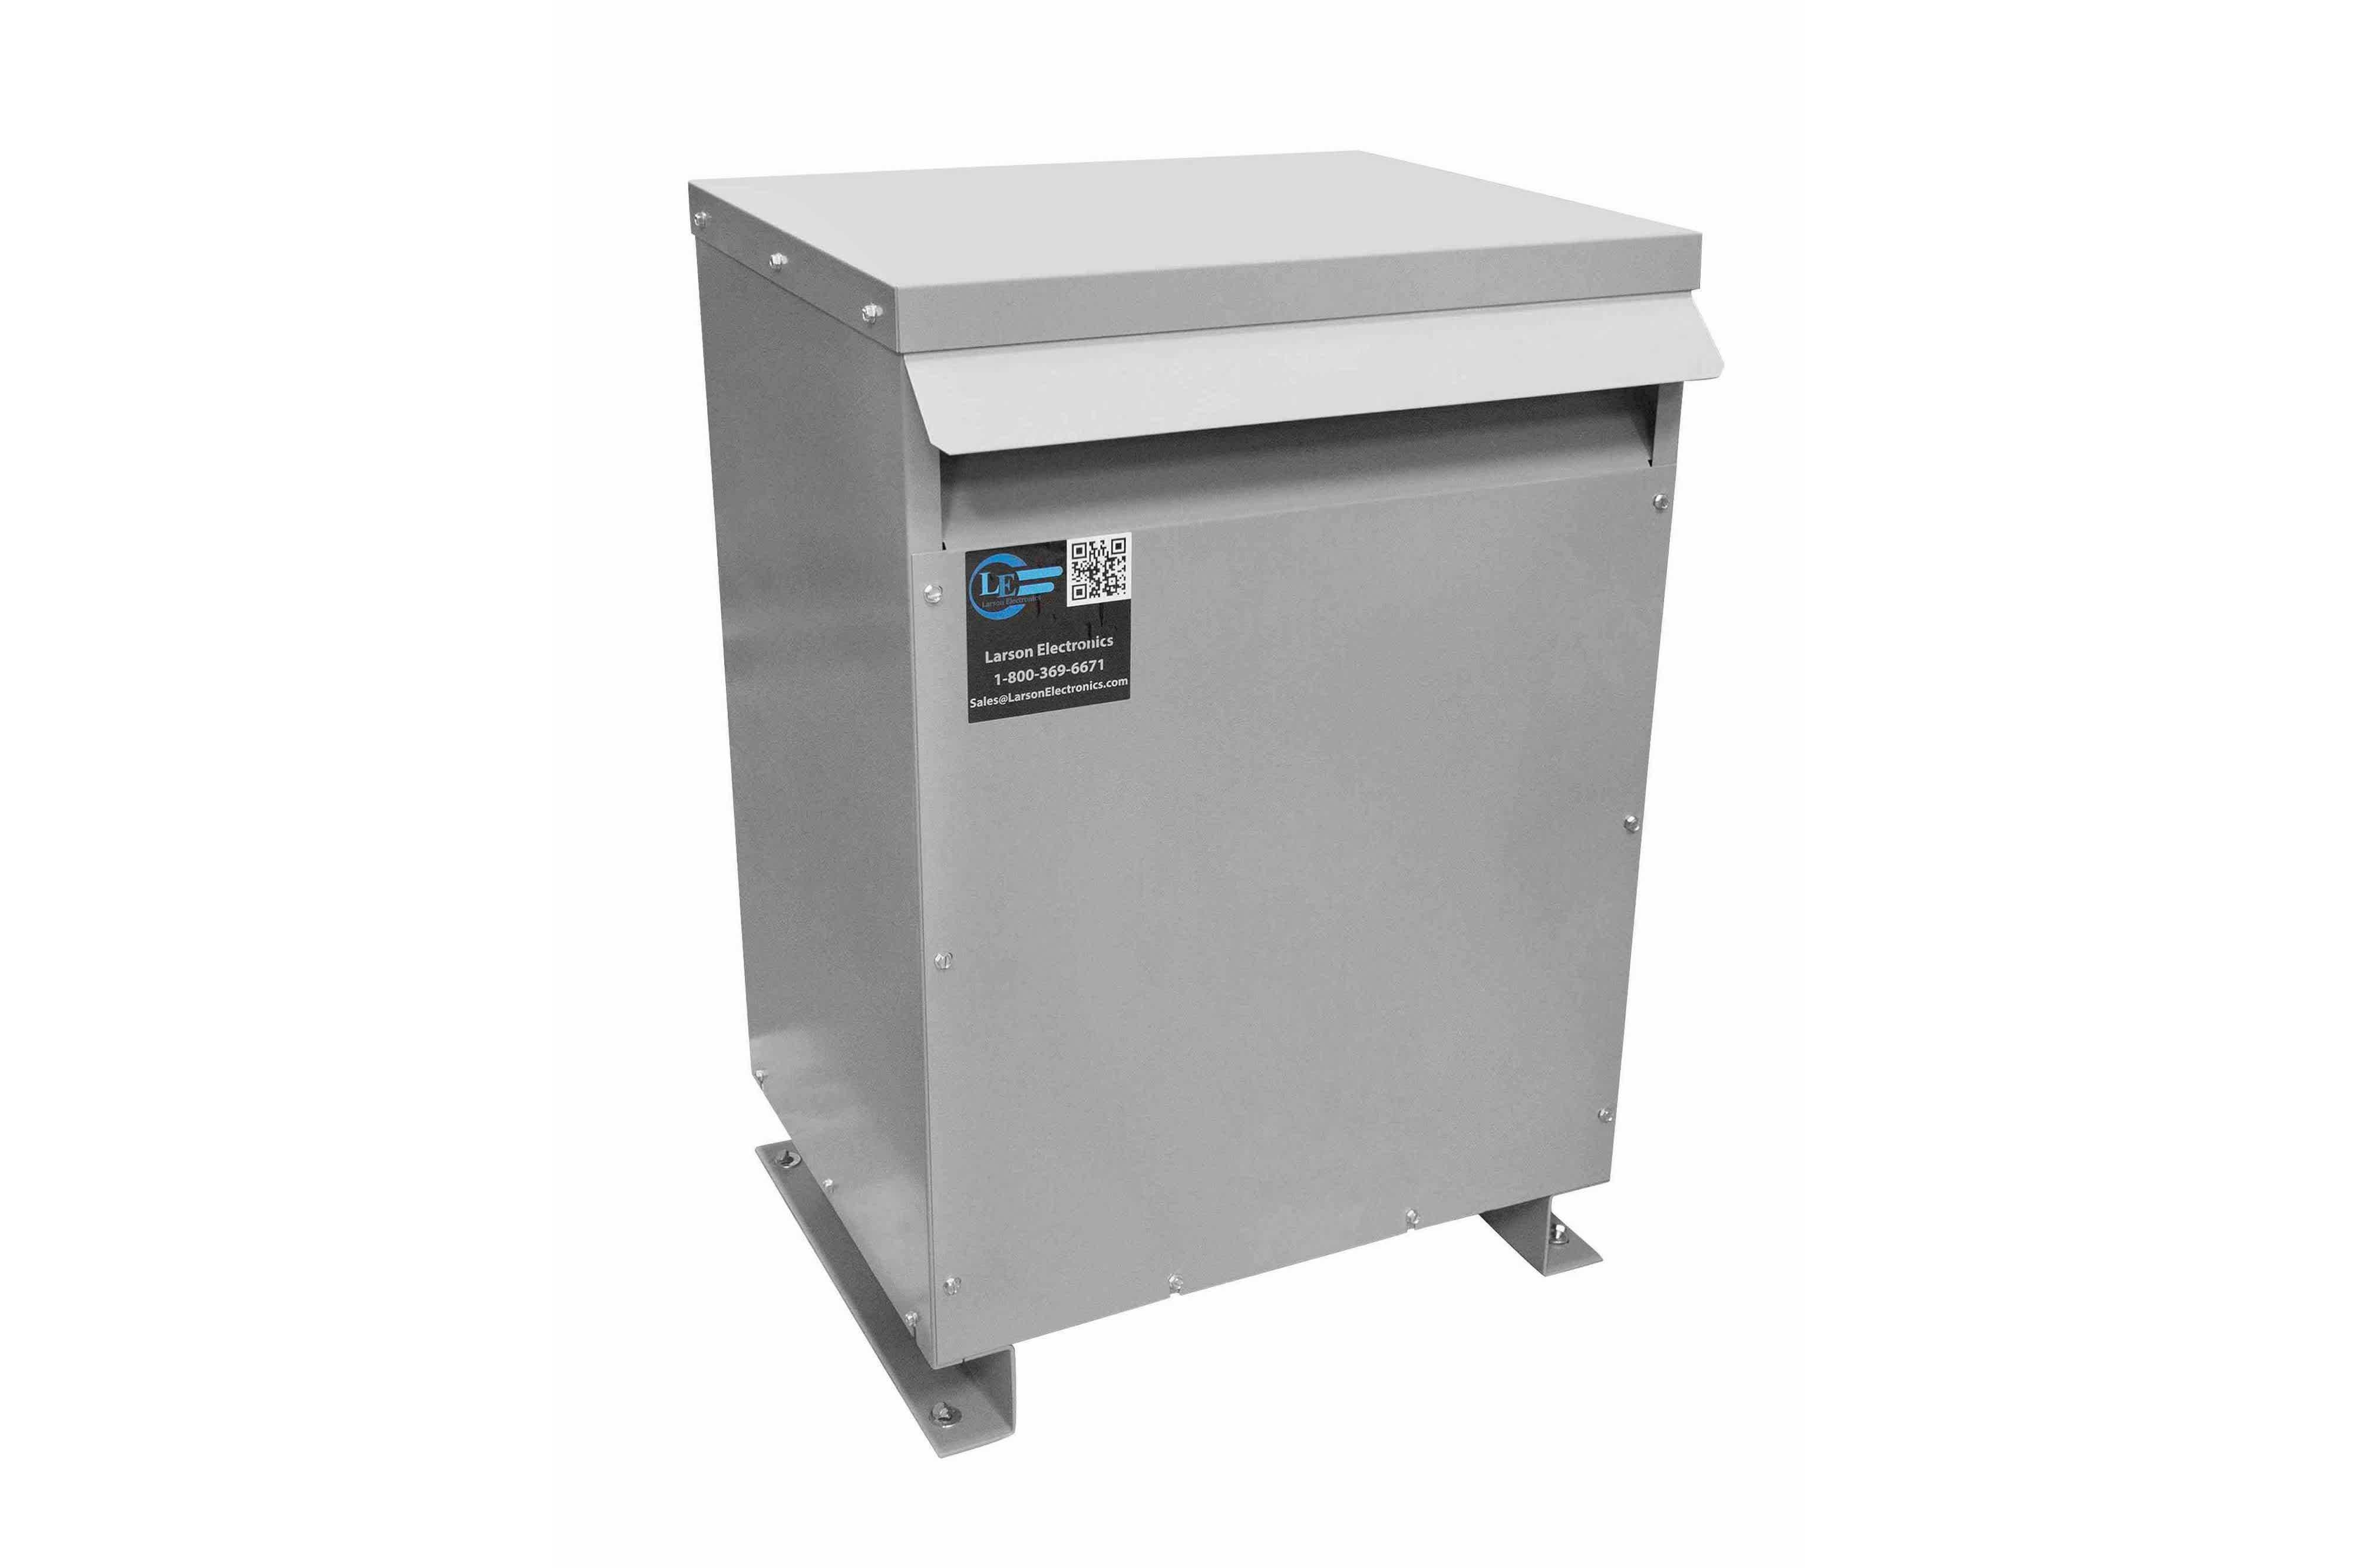 200 kVA 3PH DOE Transformer, 460V Delta Primary, 600Y/347 Wye-N Secondary, N3R, Ventilated, 60 Hz